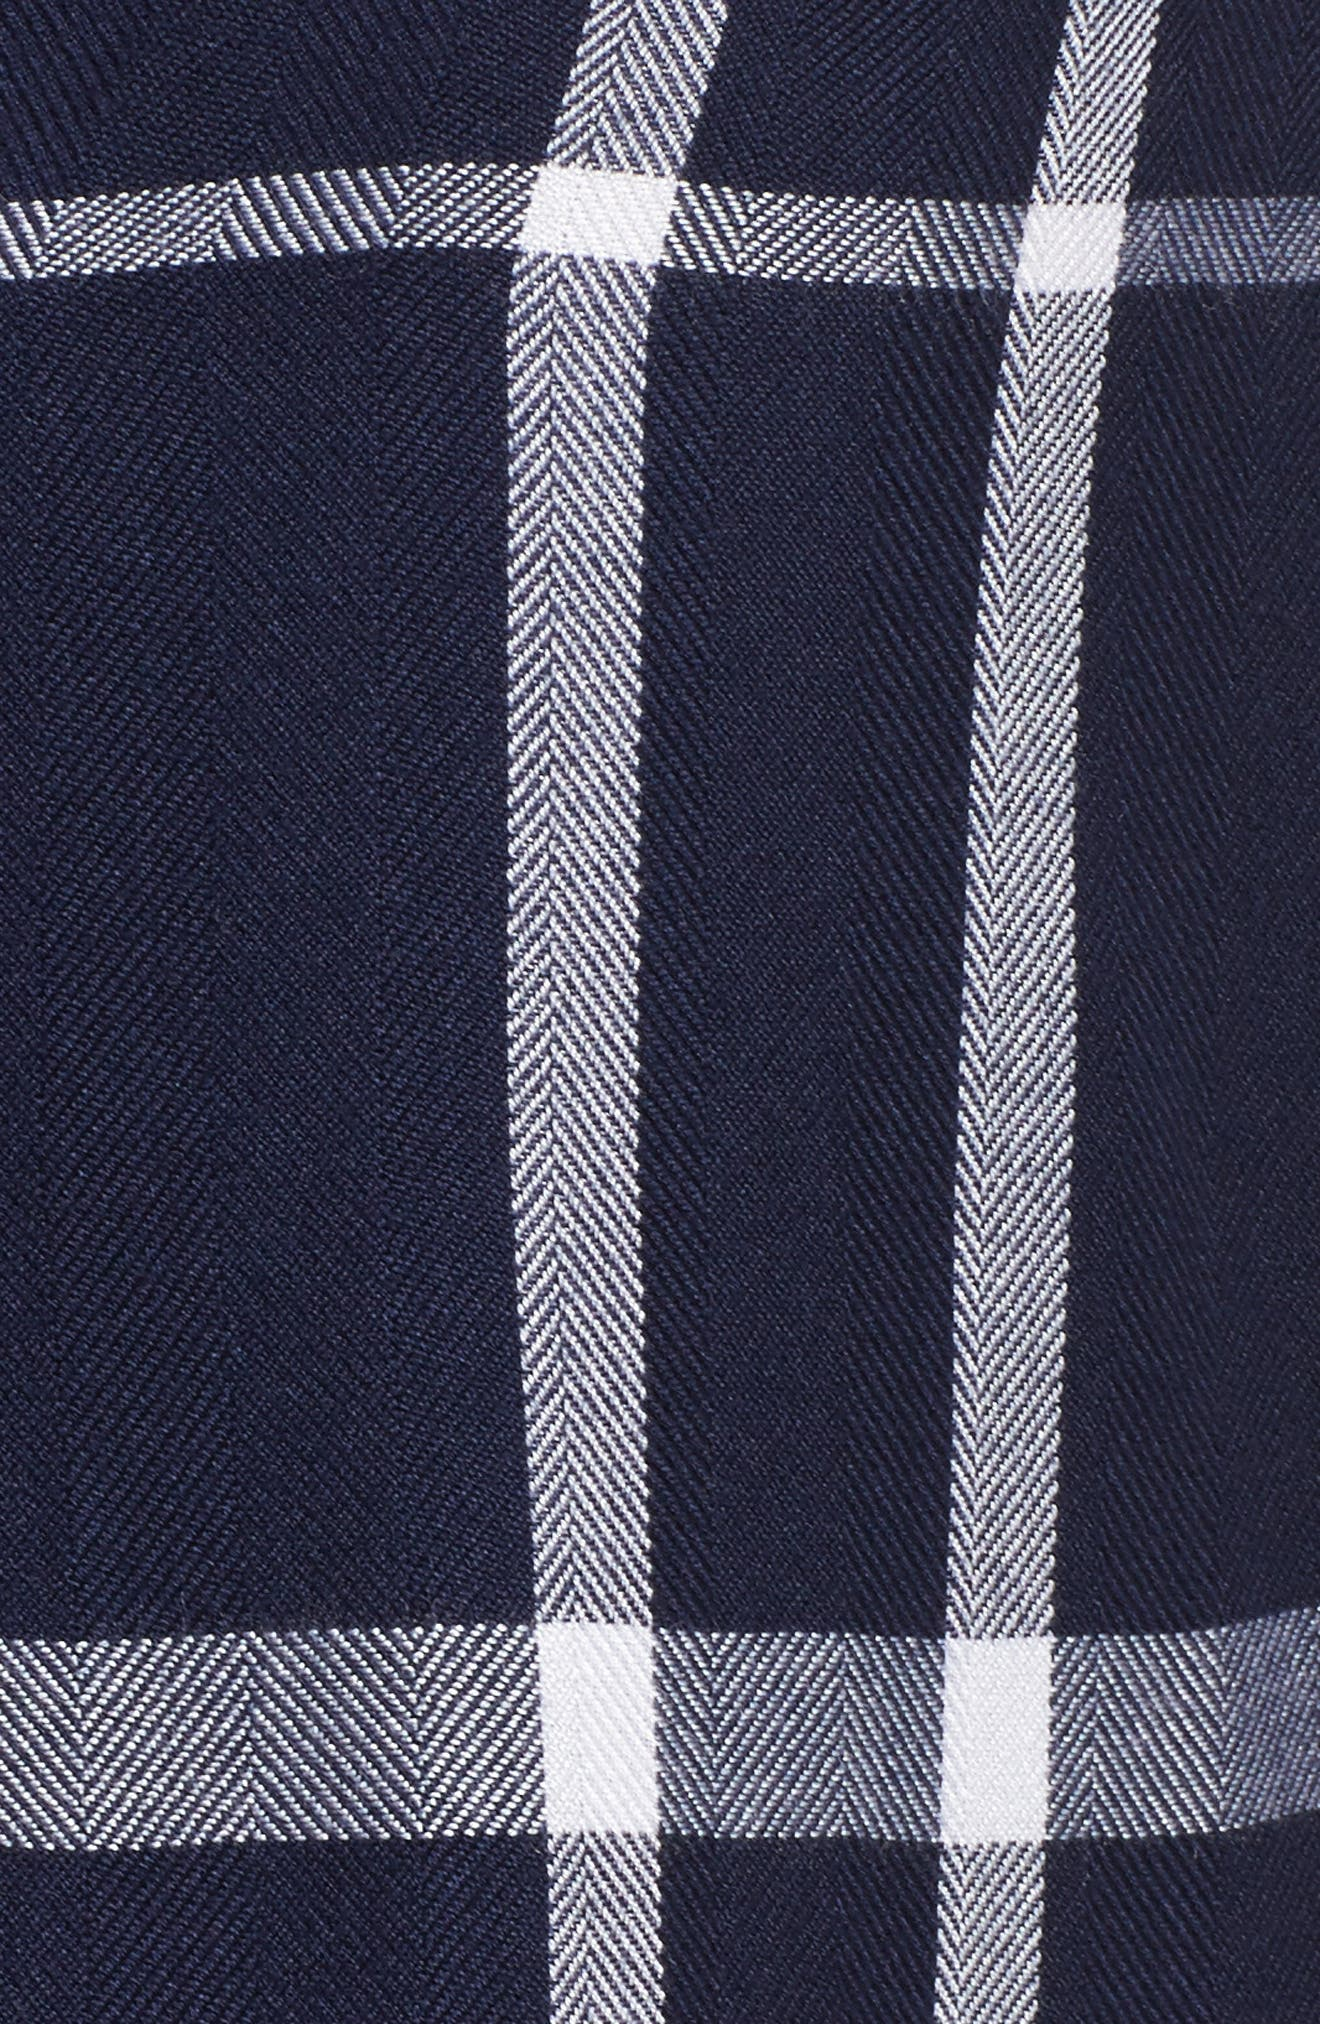 Plaid Pajamas,                             Alternate thumbnail 5, color,                             CADET/ WHITE